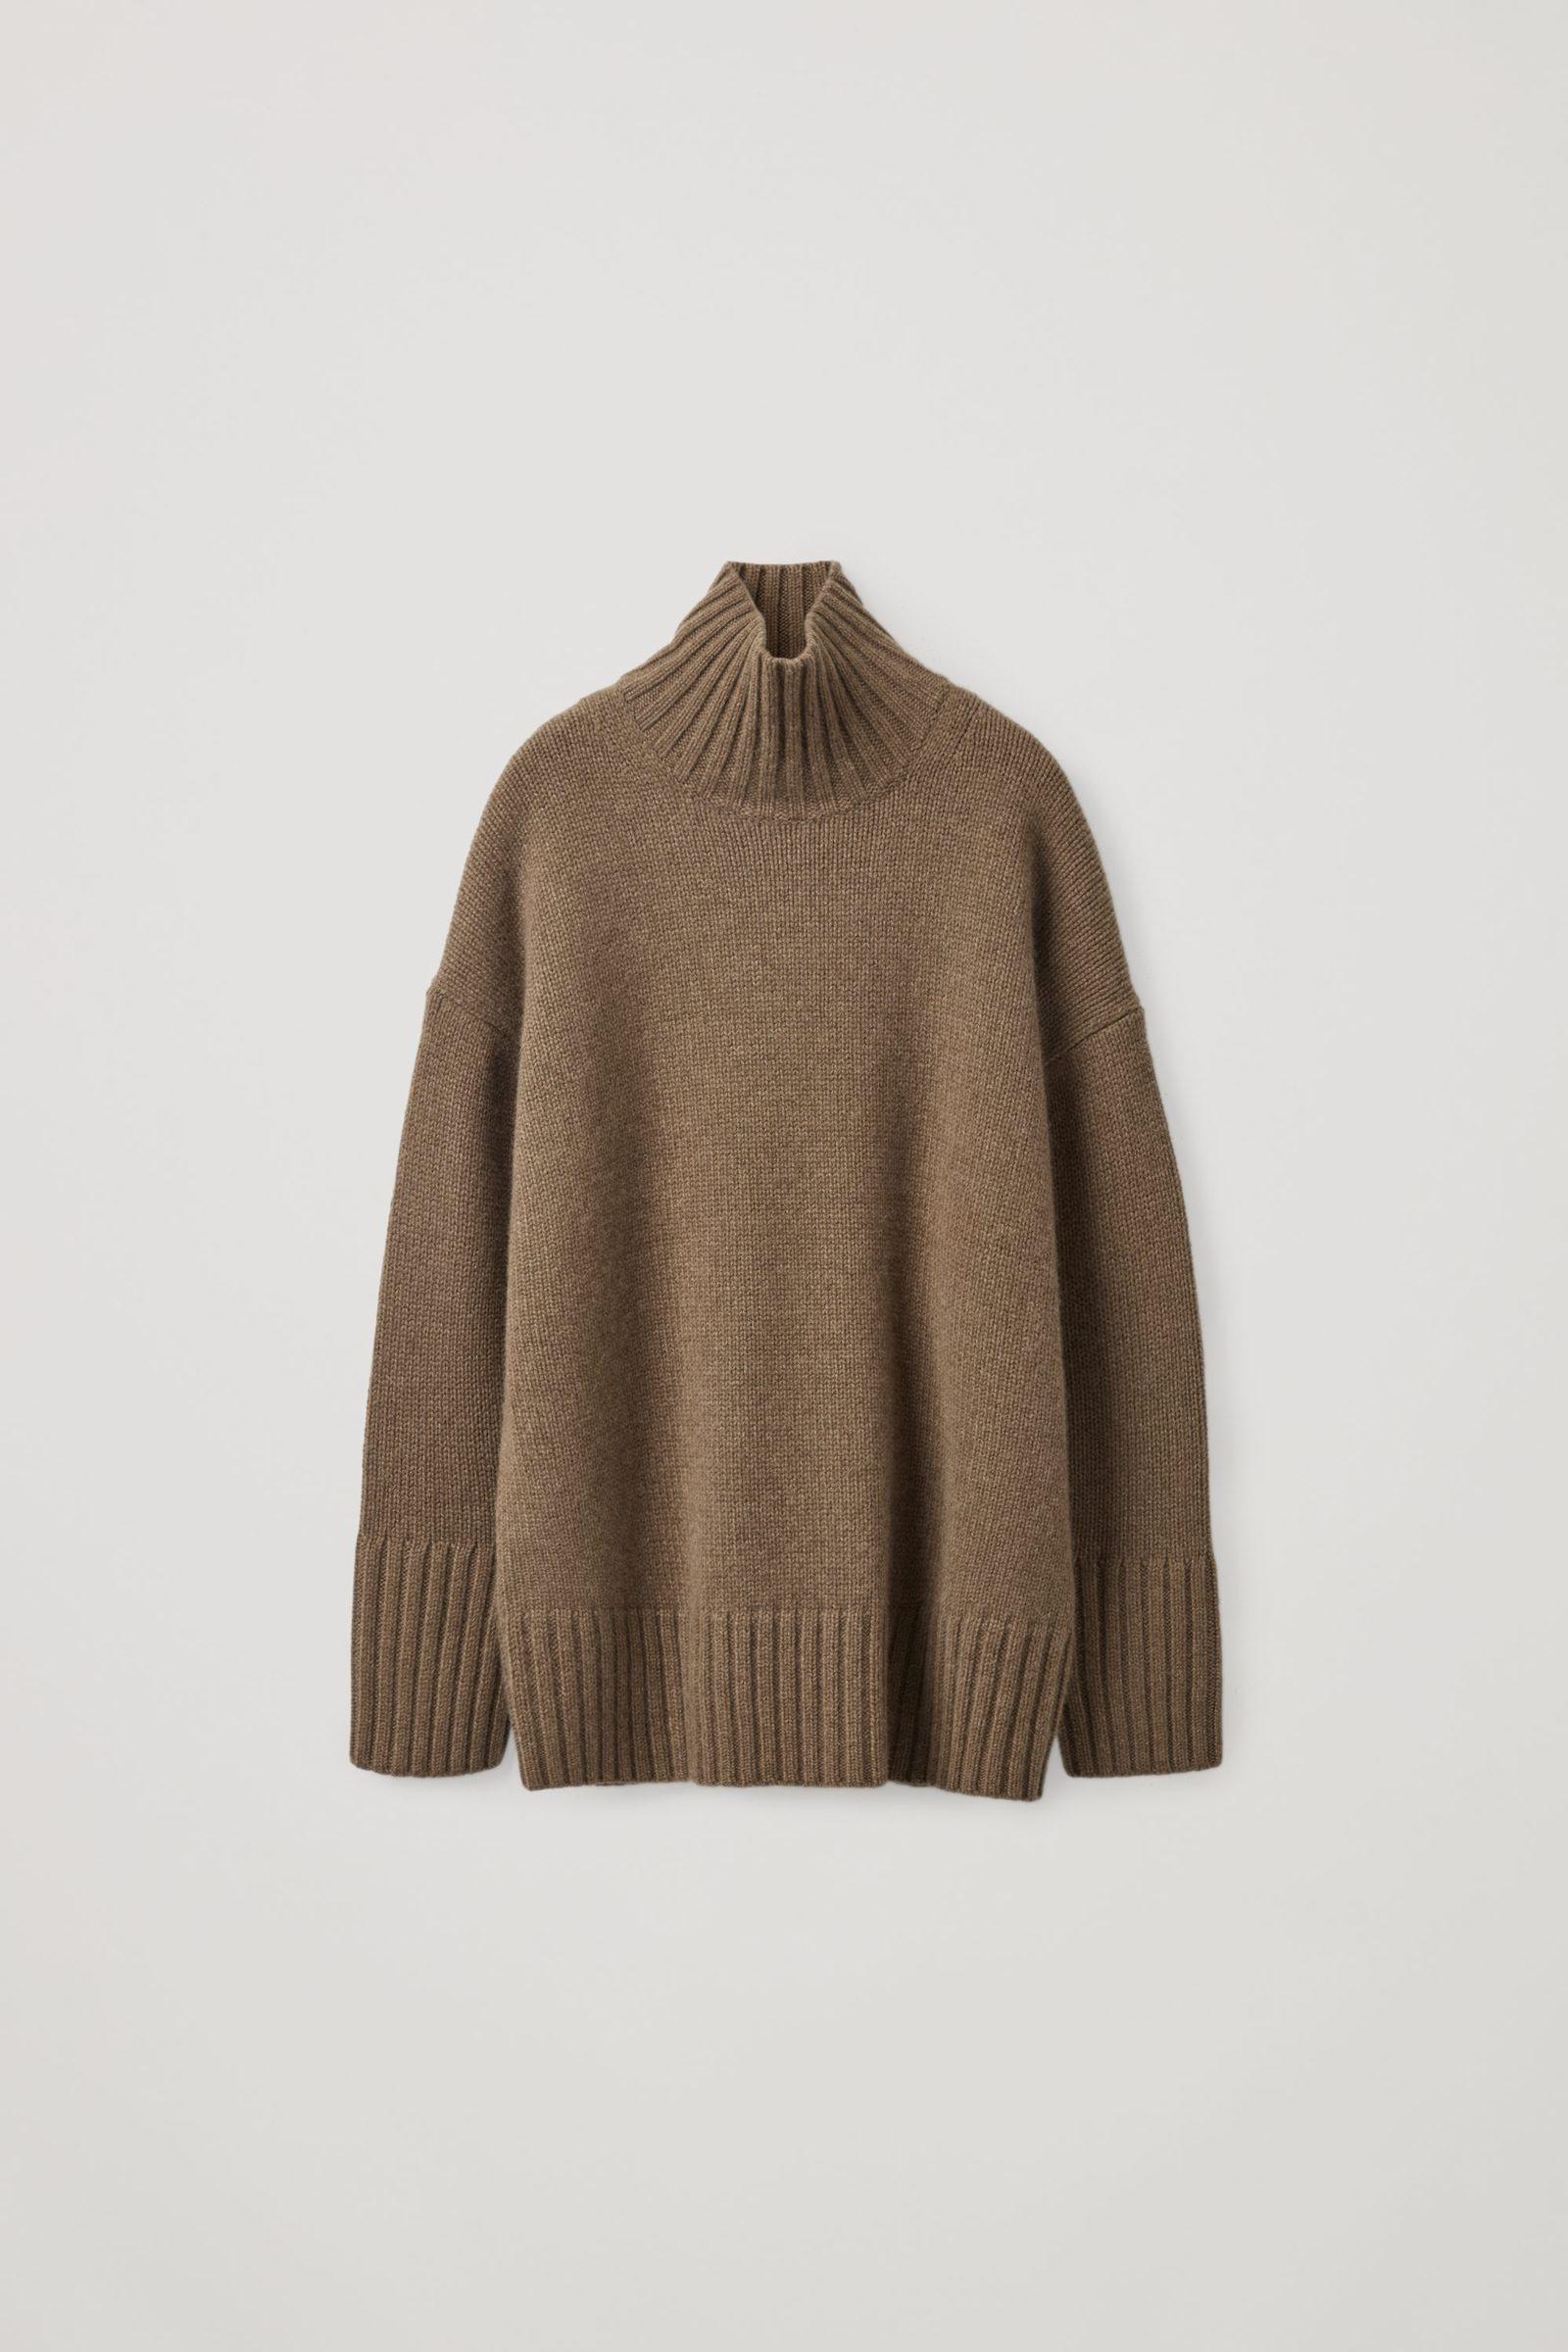 COS 캐시미어 퍼넬 넥 스웨터의 브라운컬러 Product입니다.